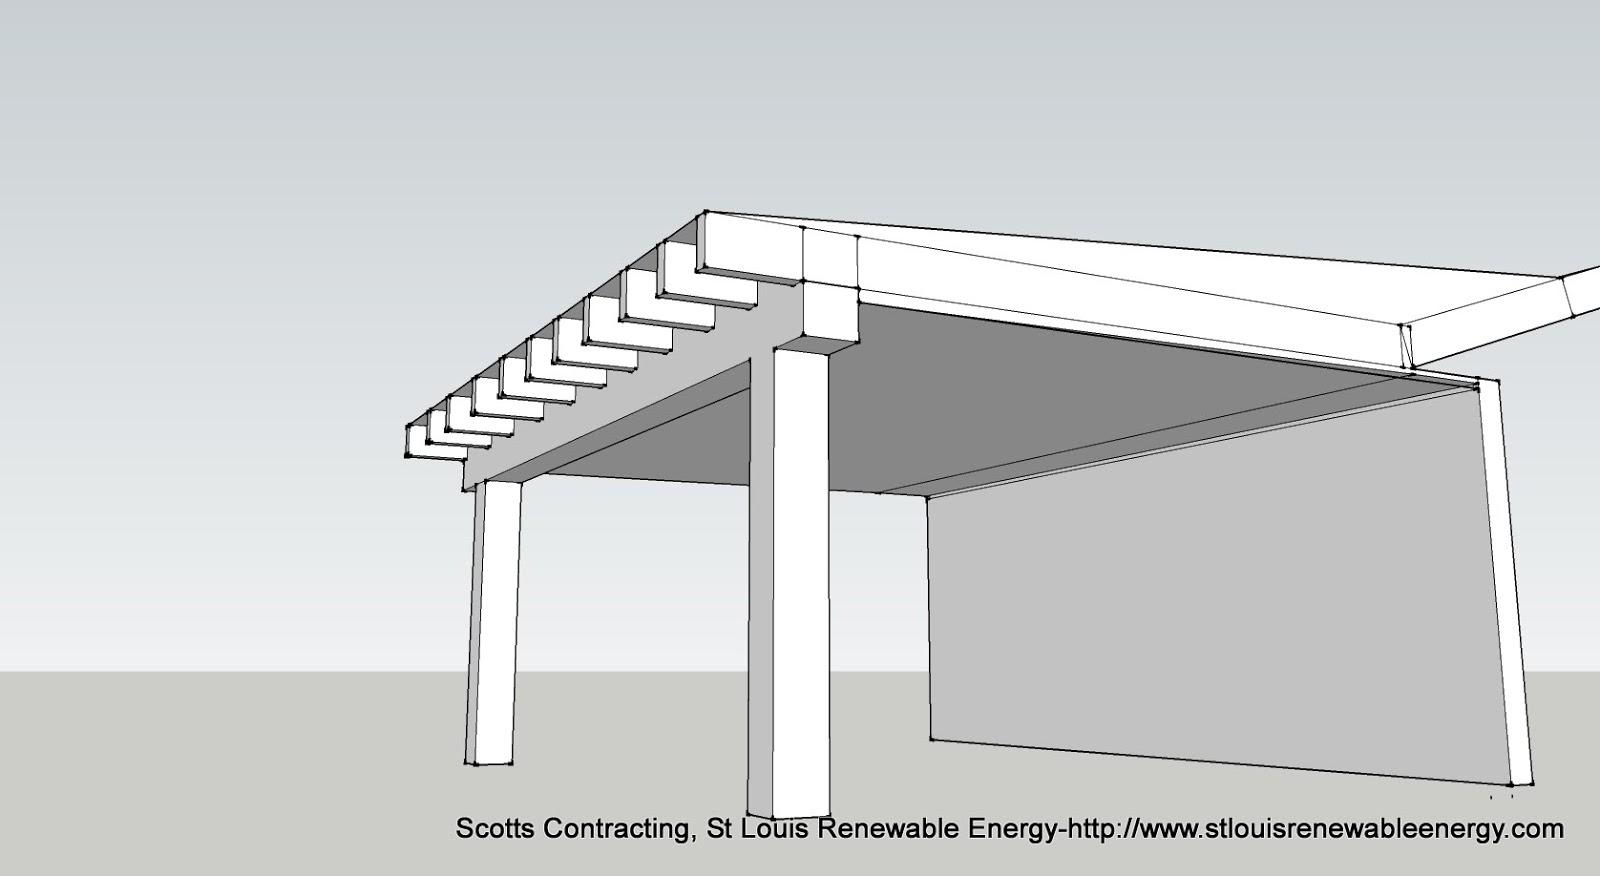 Stlouis renewable energy misc google sketch up porch for Open porch roof designs